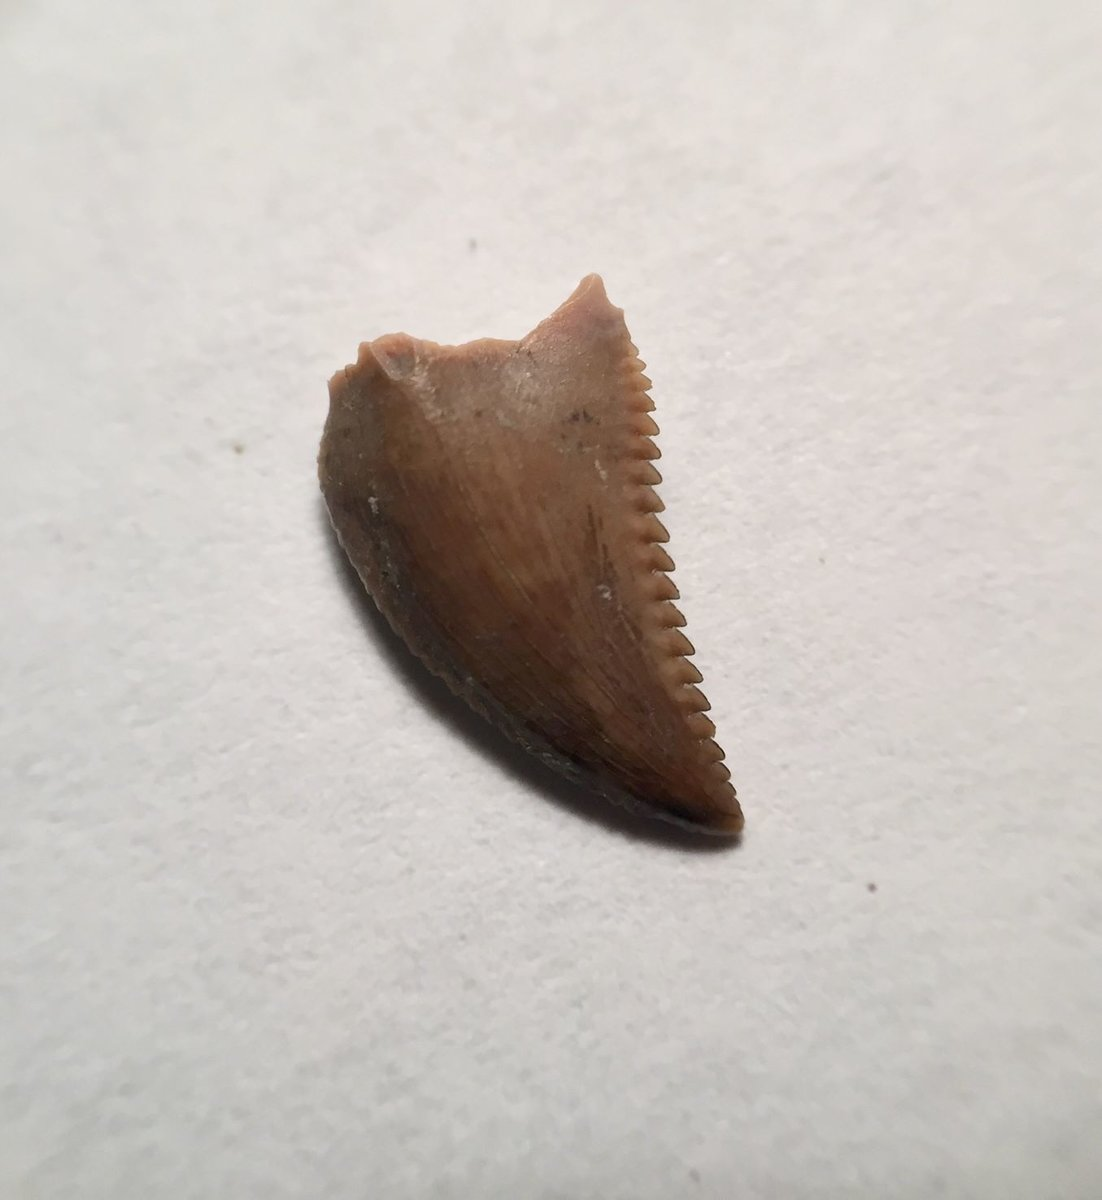 Troodon (Stenonychosaurus?) Tooth